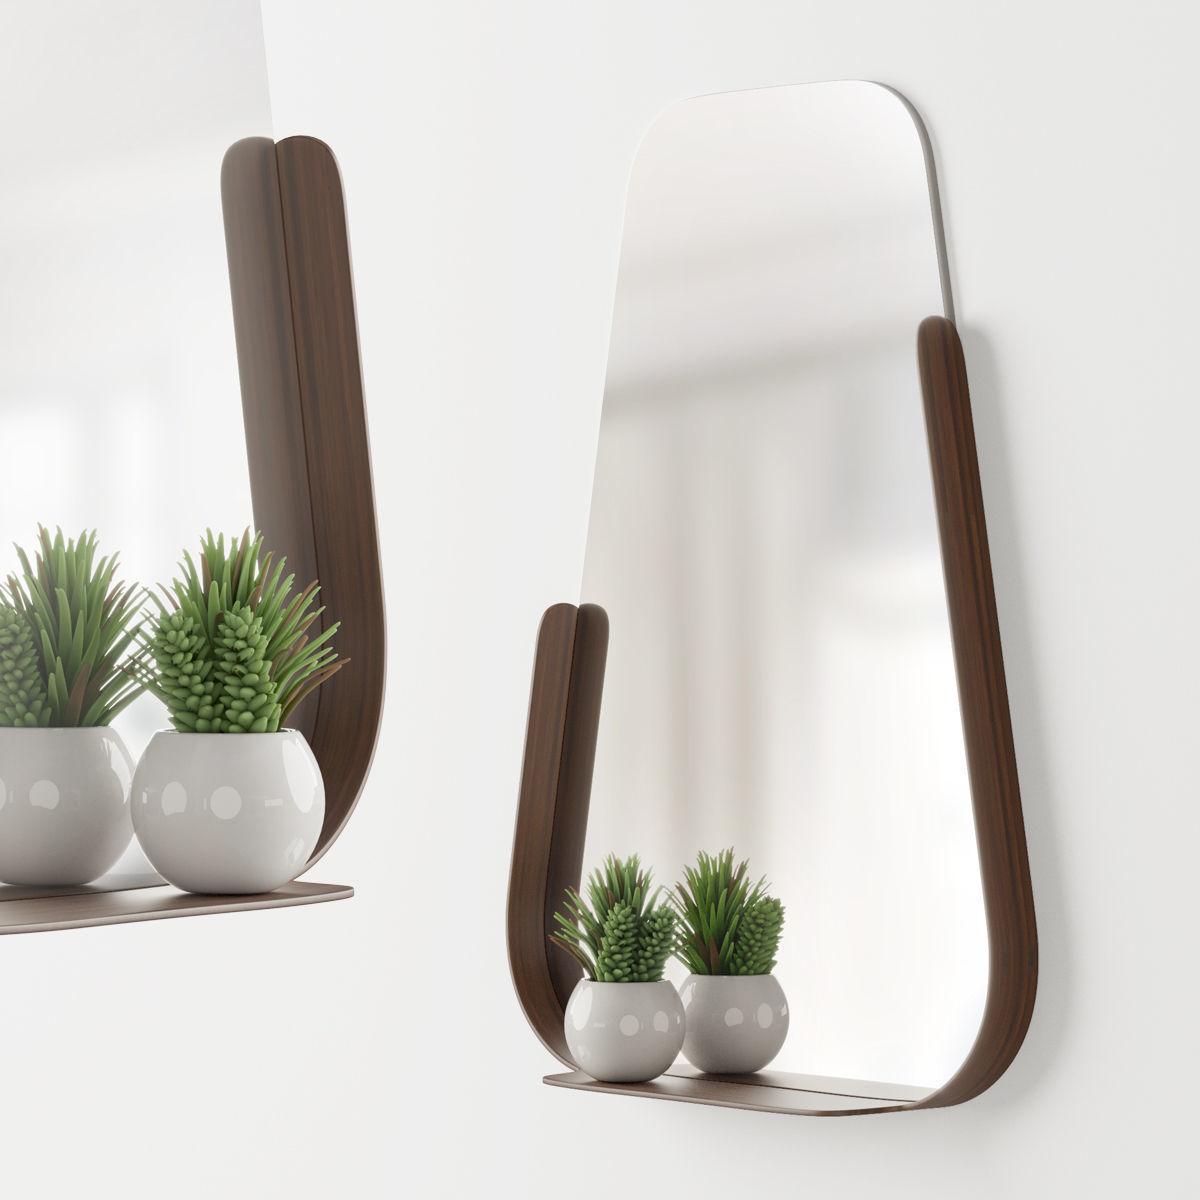 Modern mirror with shelf and decor